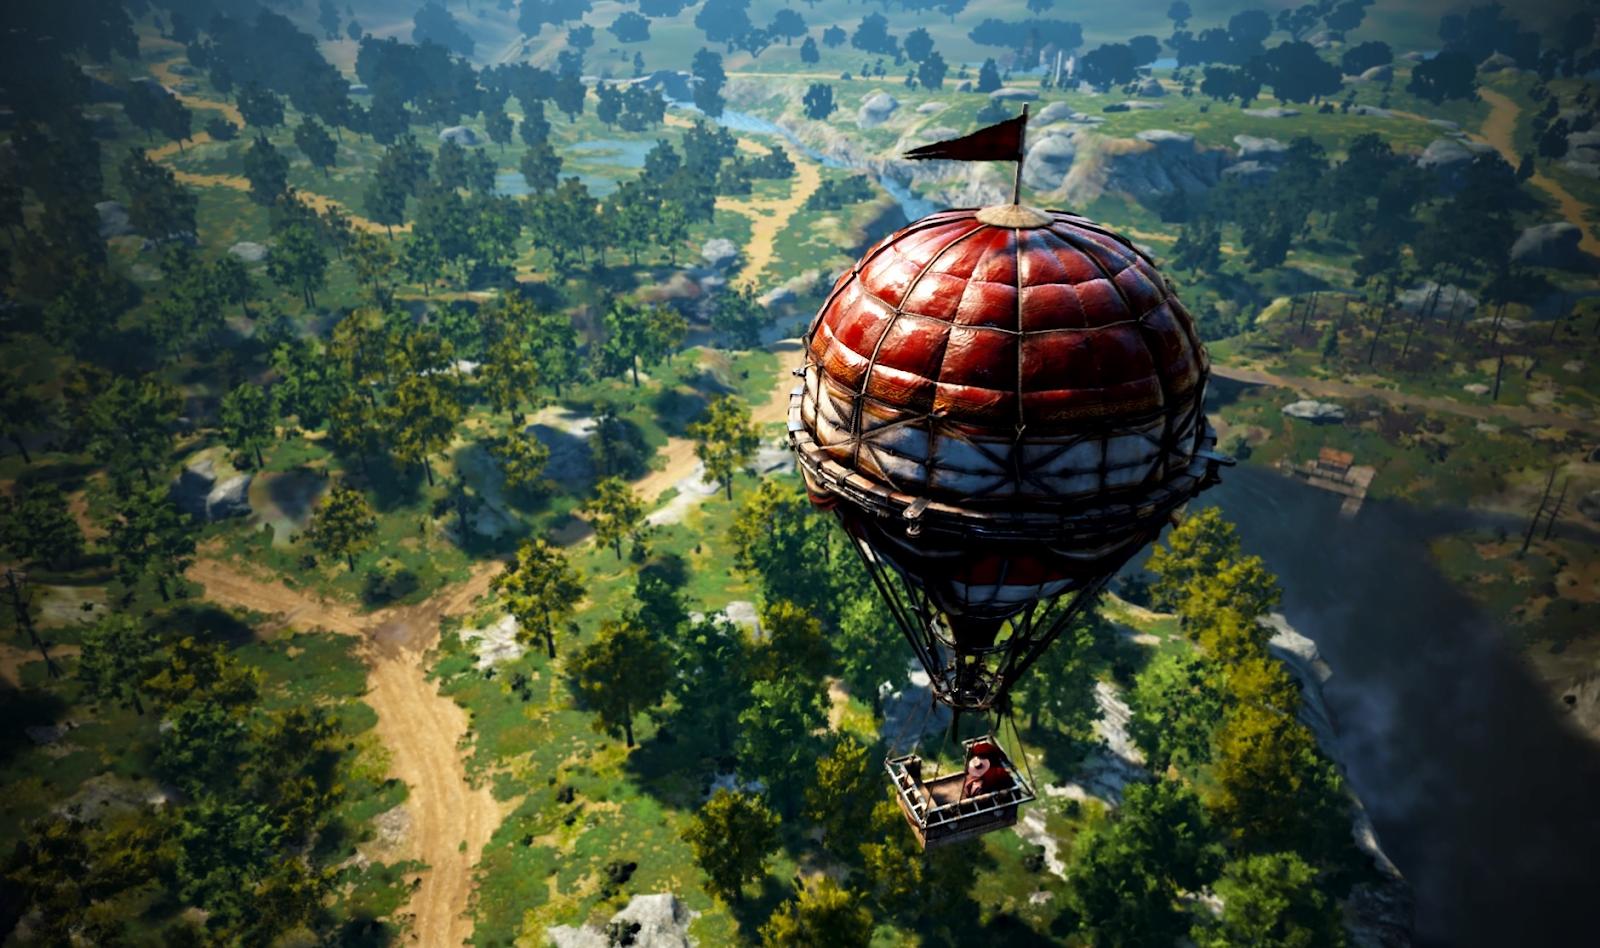 NPC Travel via Balloon